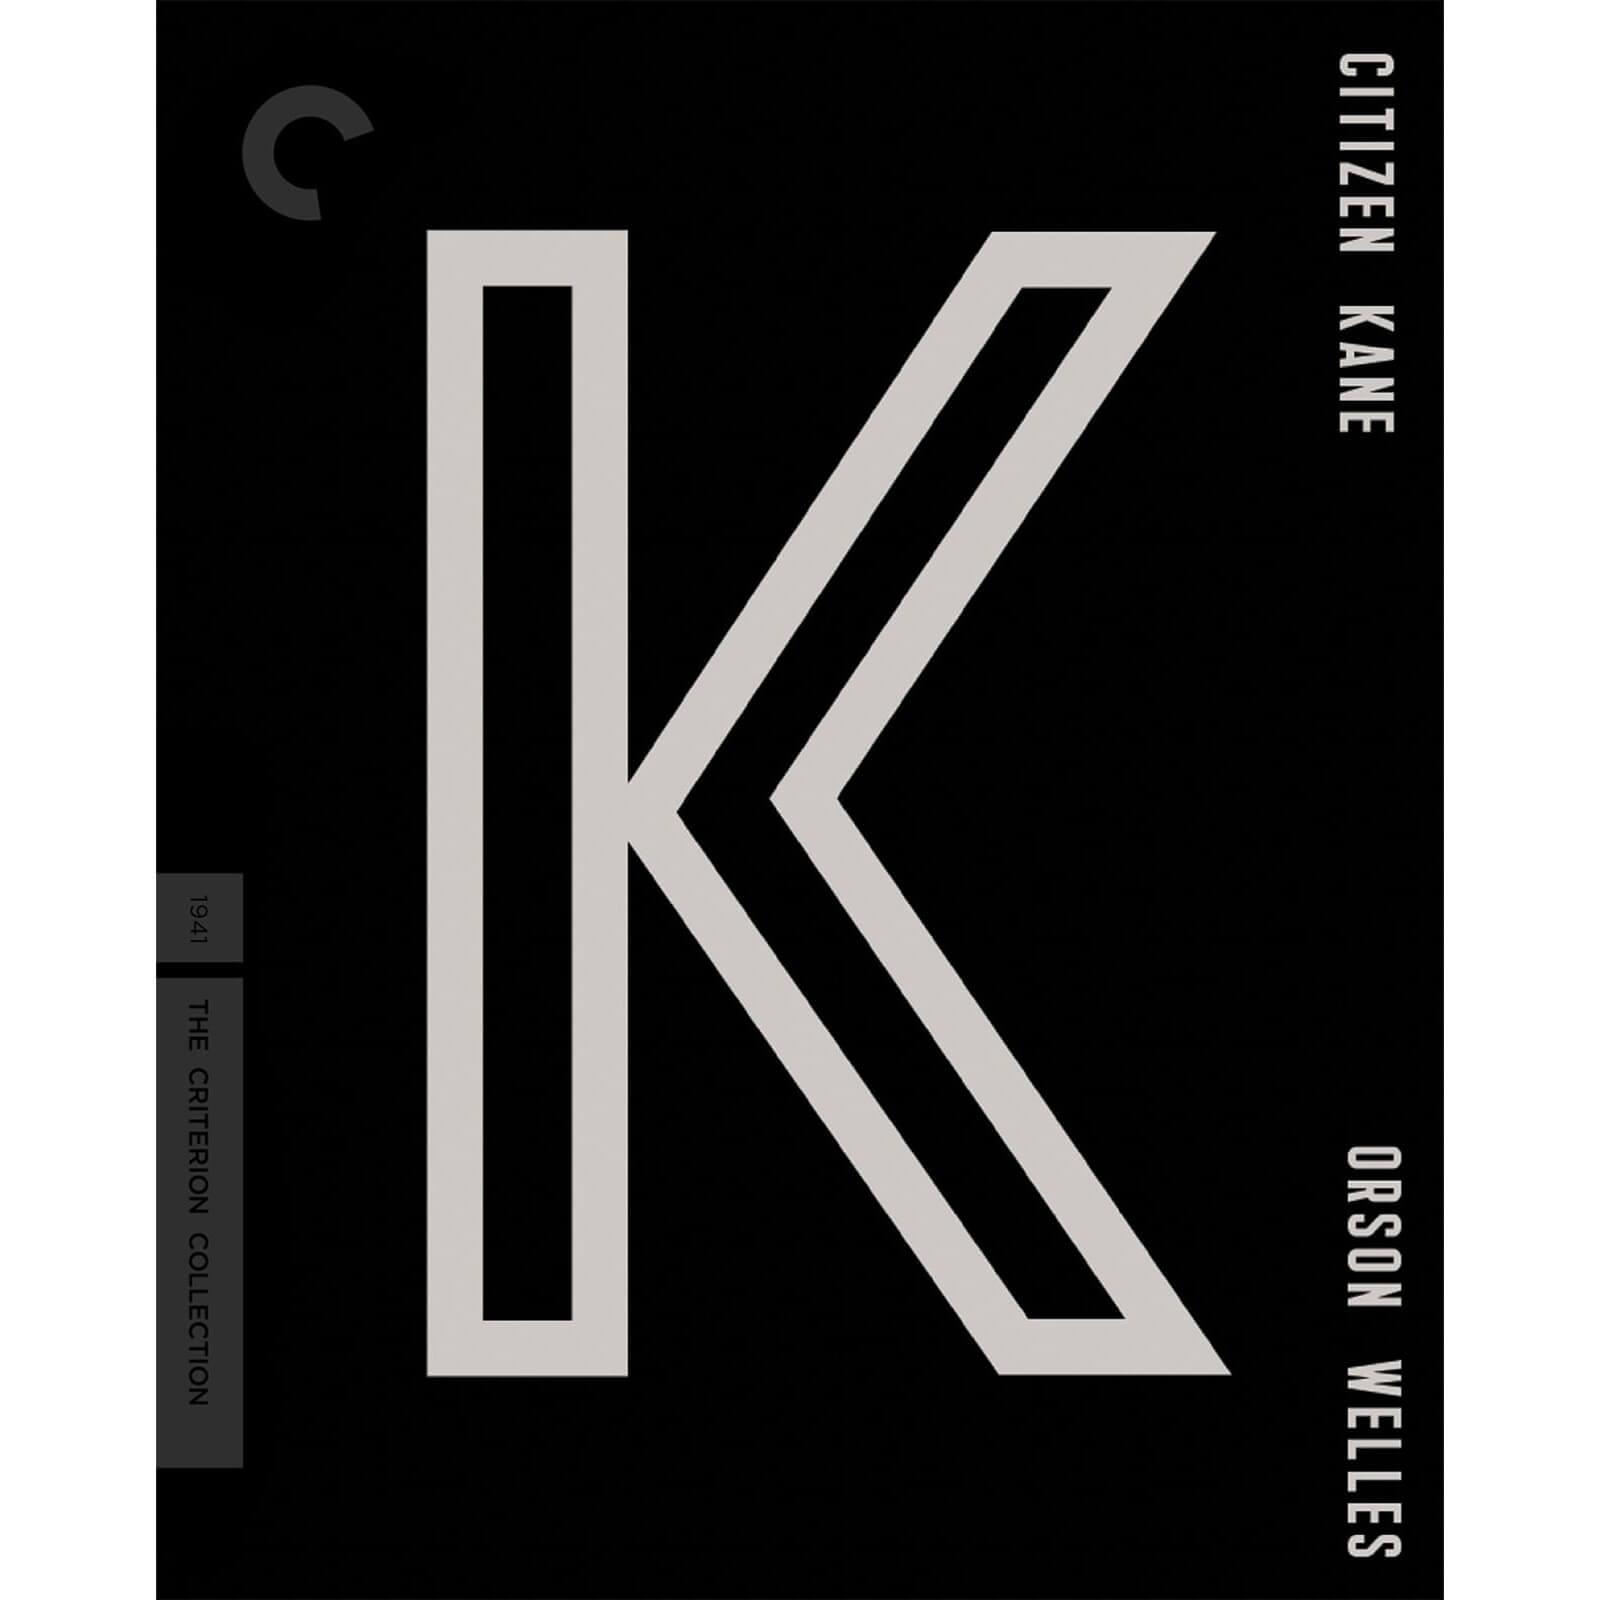 Citizen Kane - The Criterion Collection